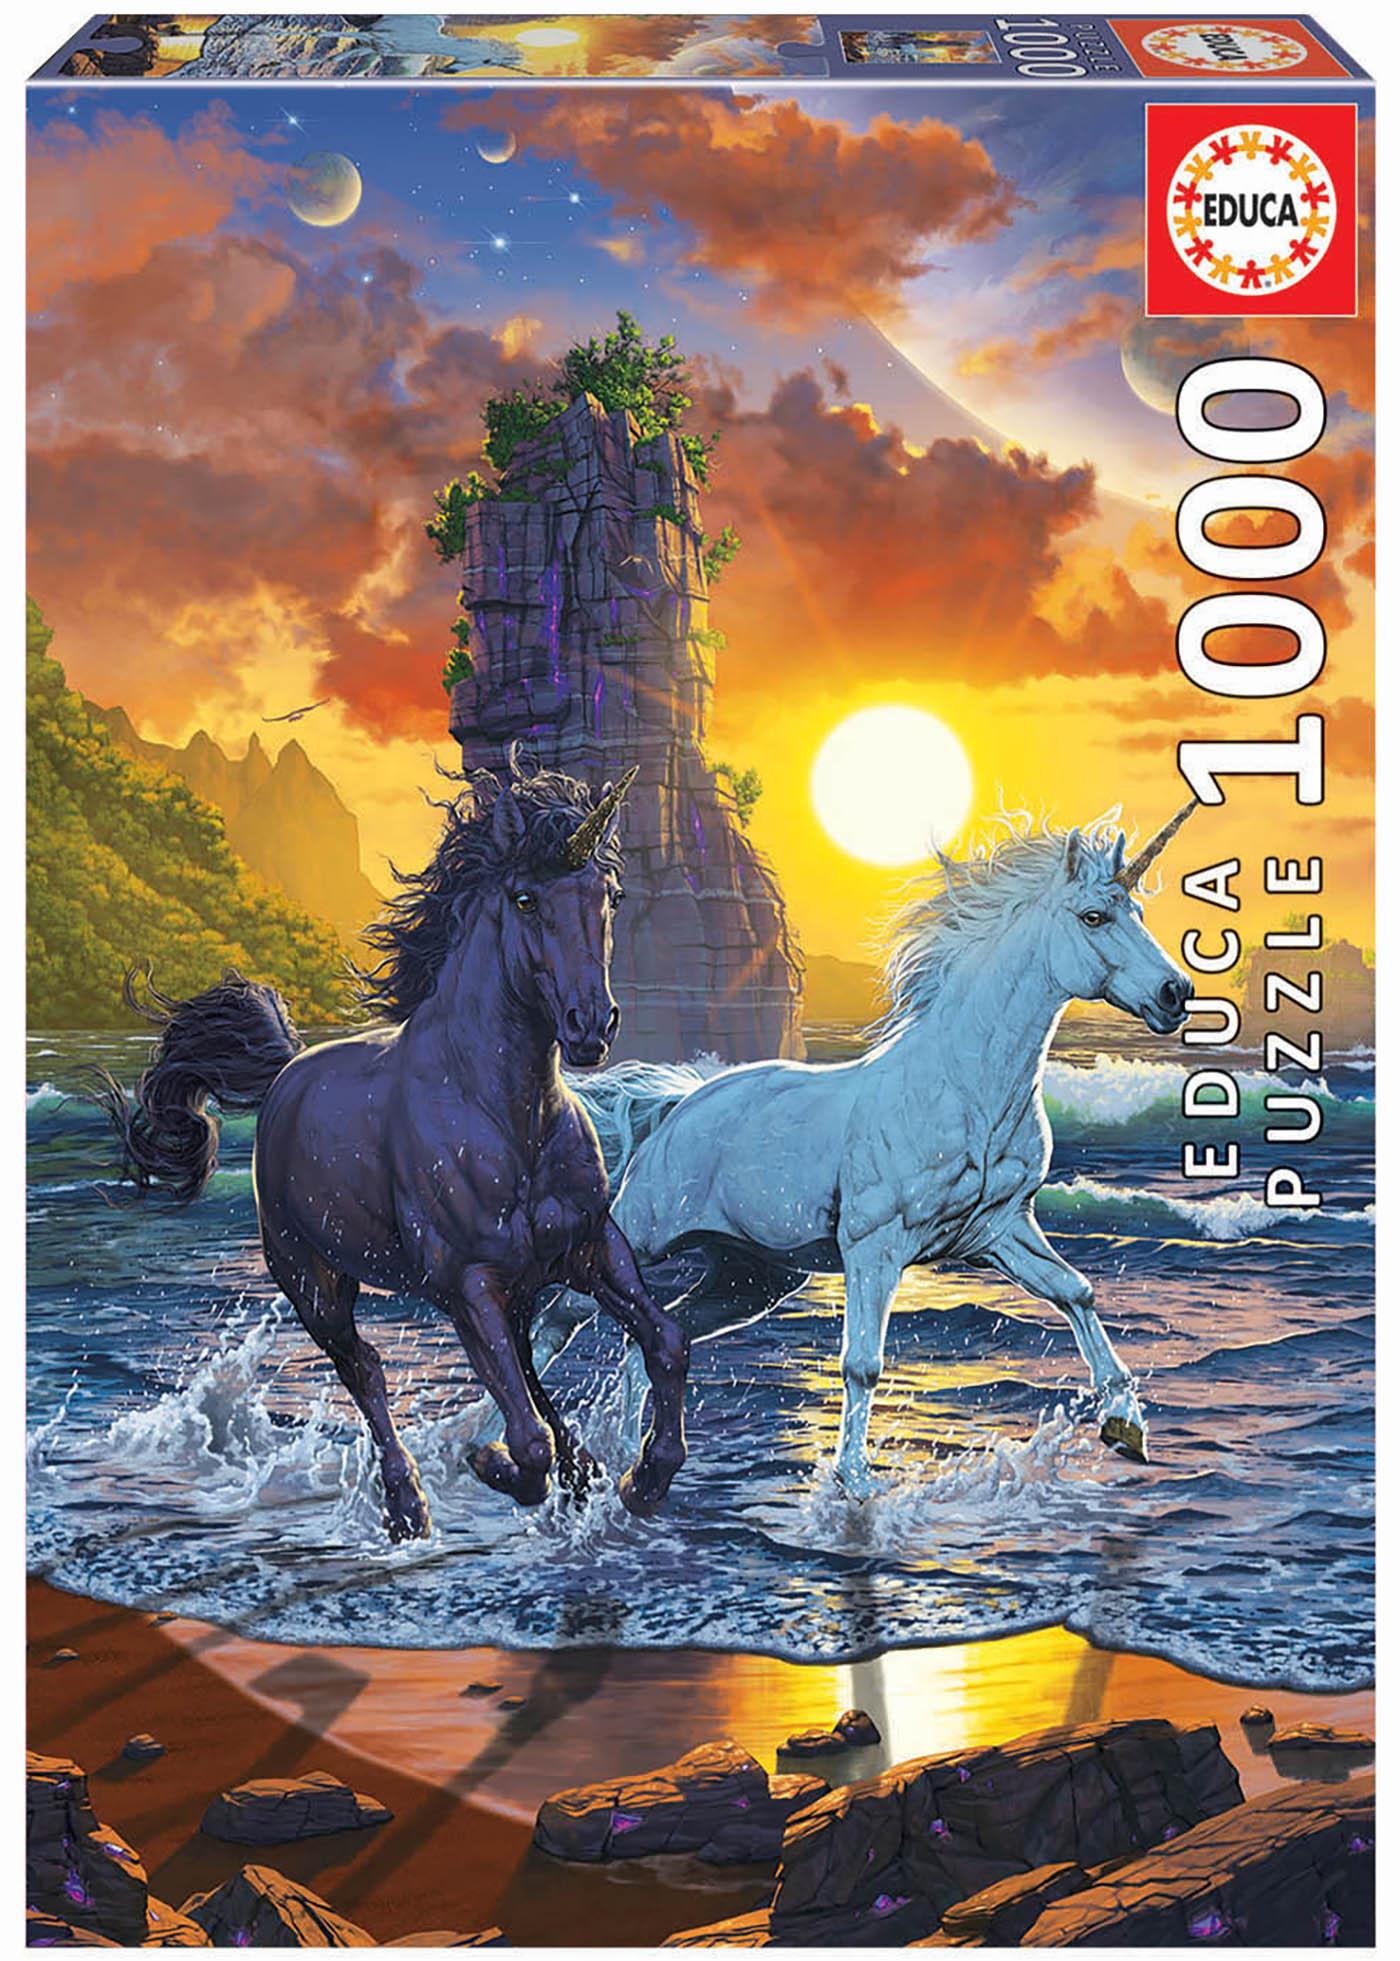 1000 Unicorns on the beach, Vincent Hie